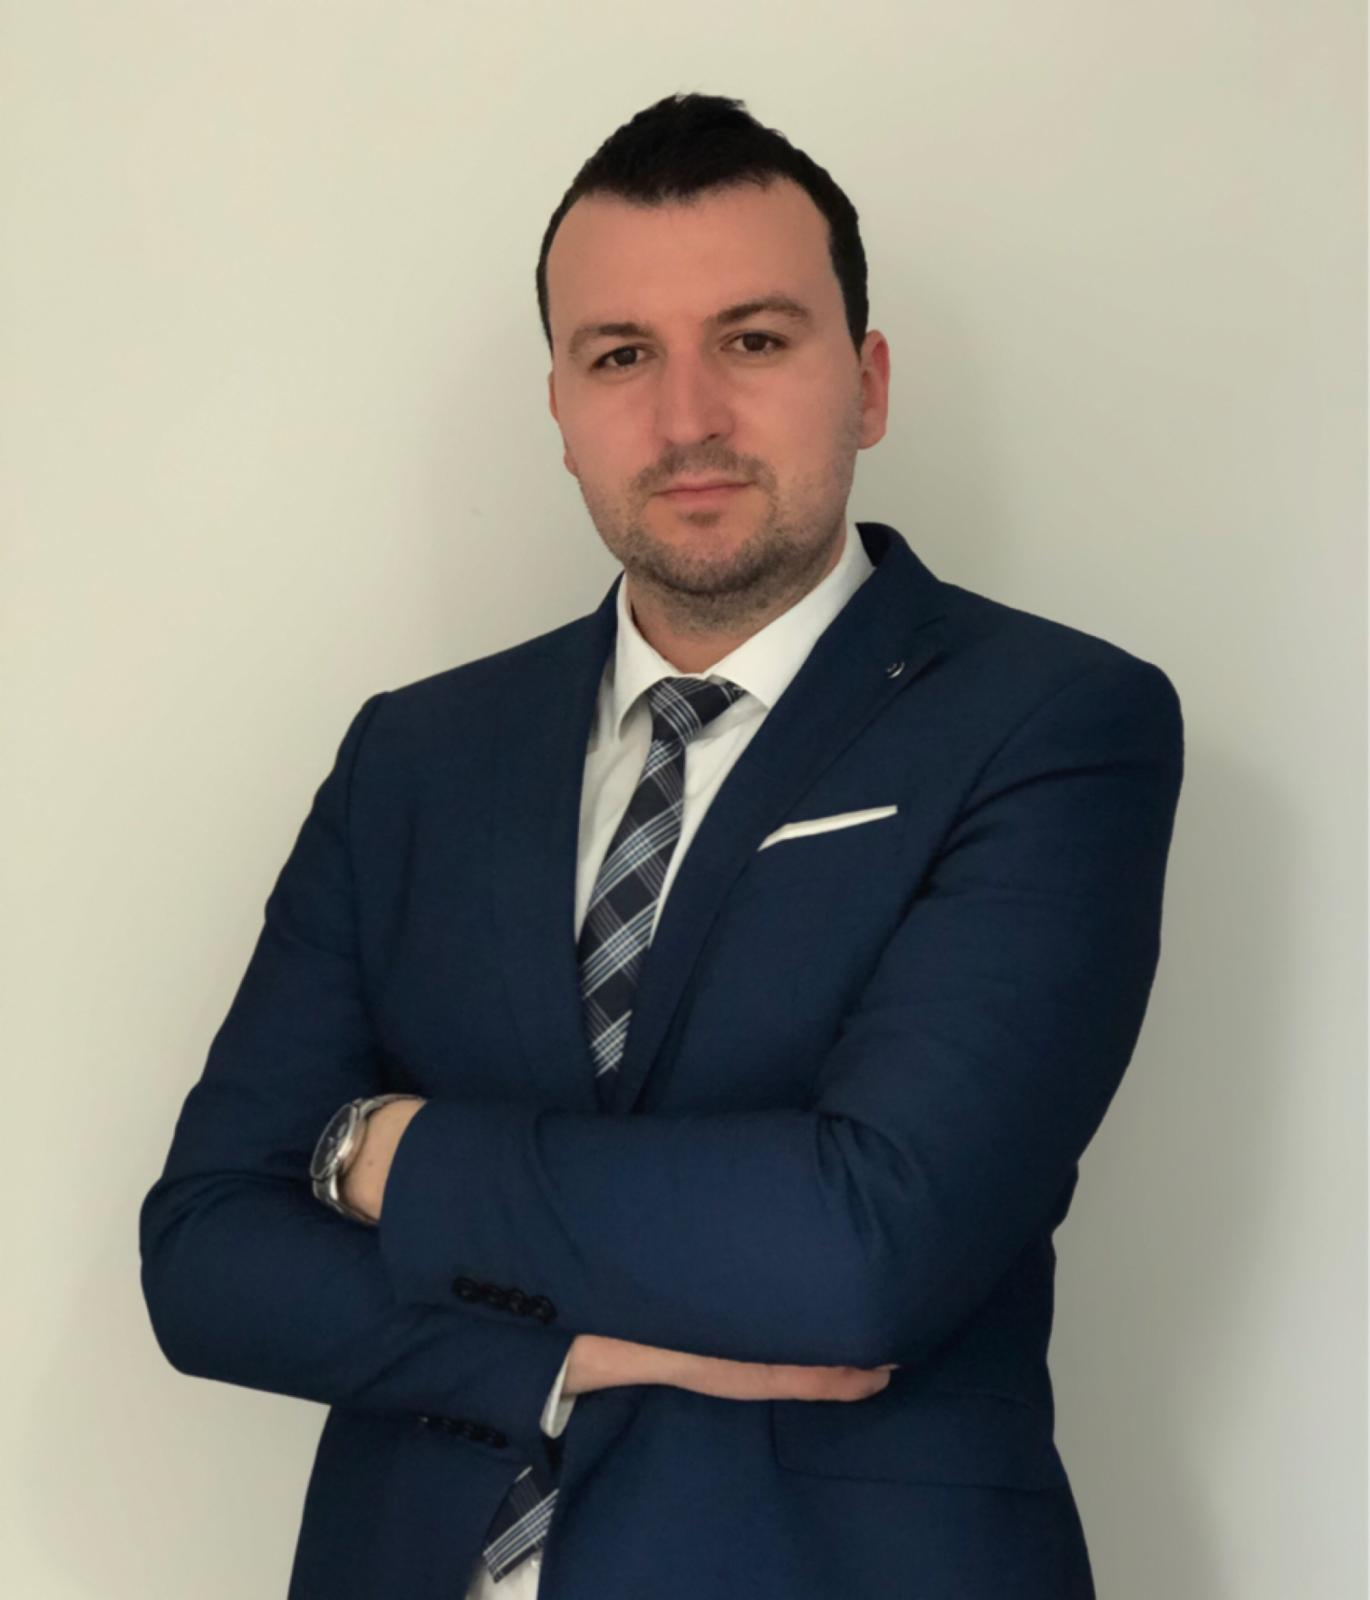 Mr. Adnan Crnica